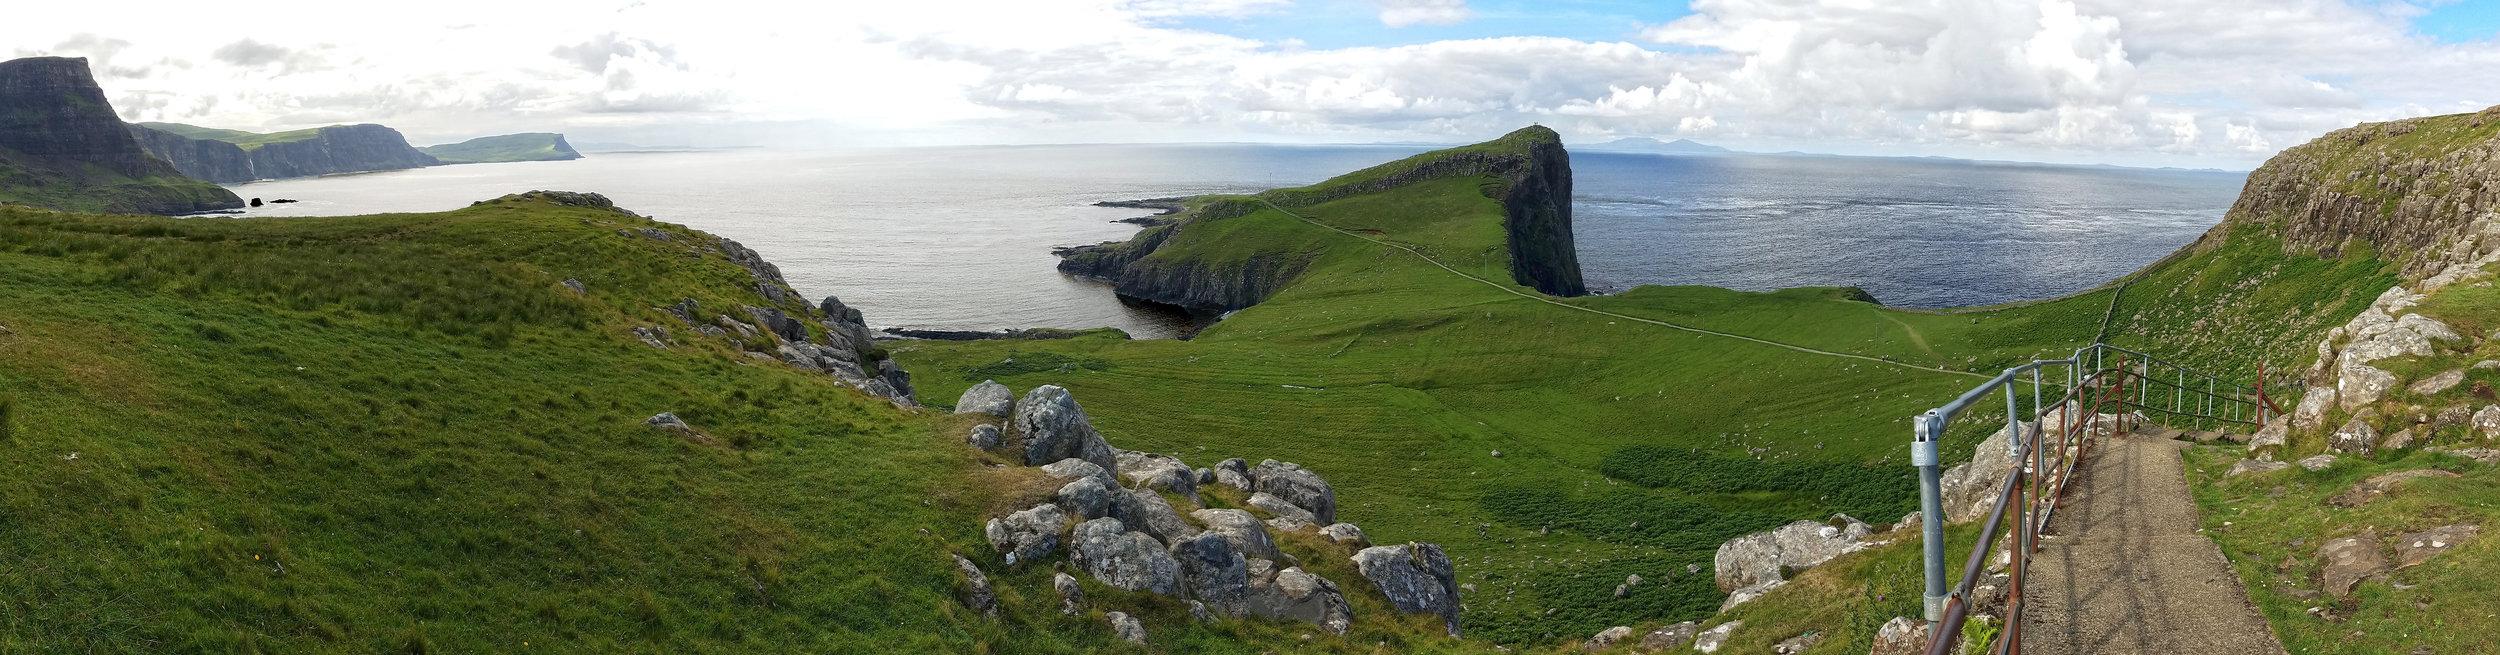 Neist Point Lighthouse Path Panorama